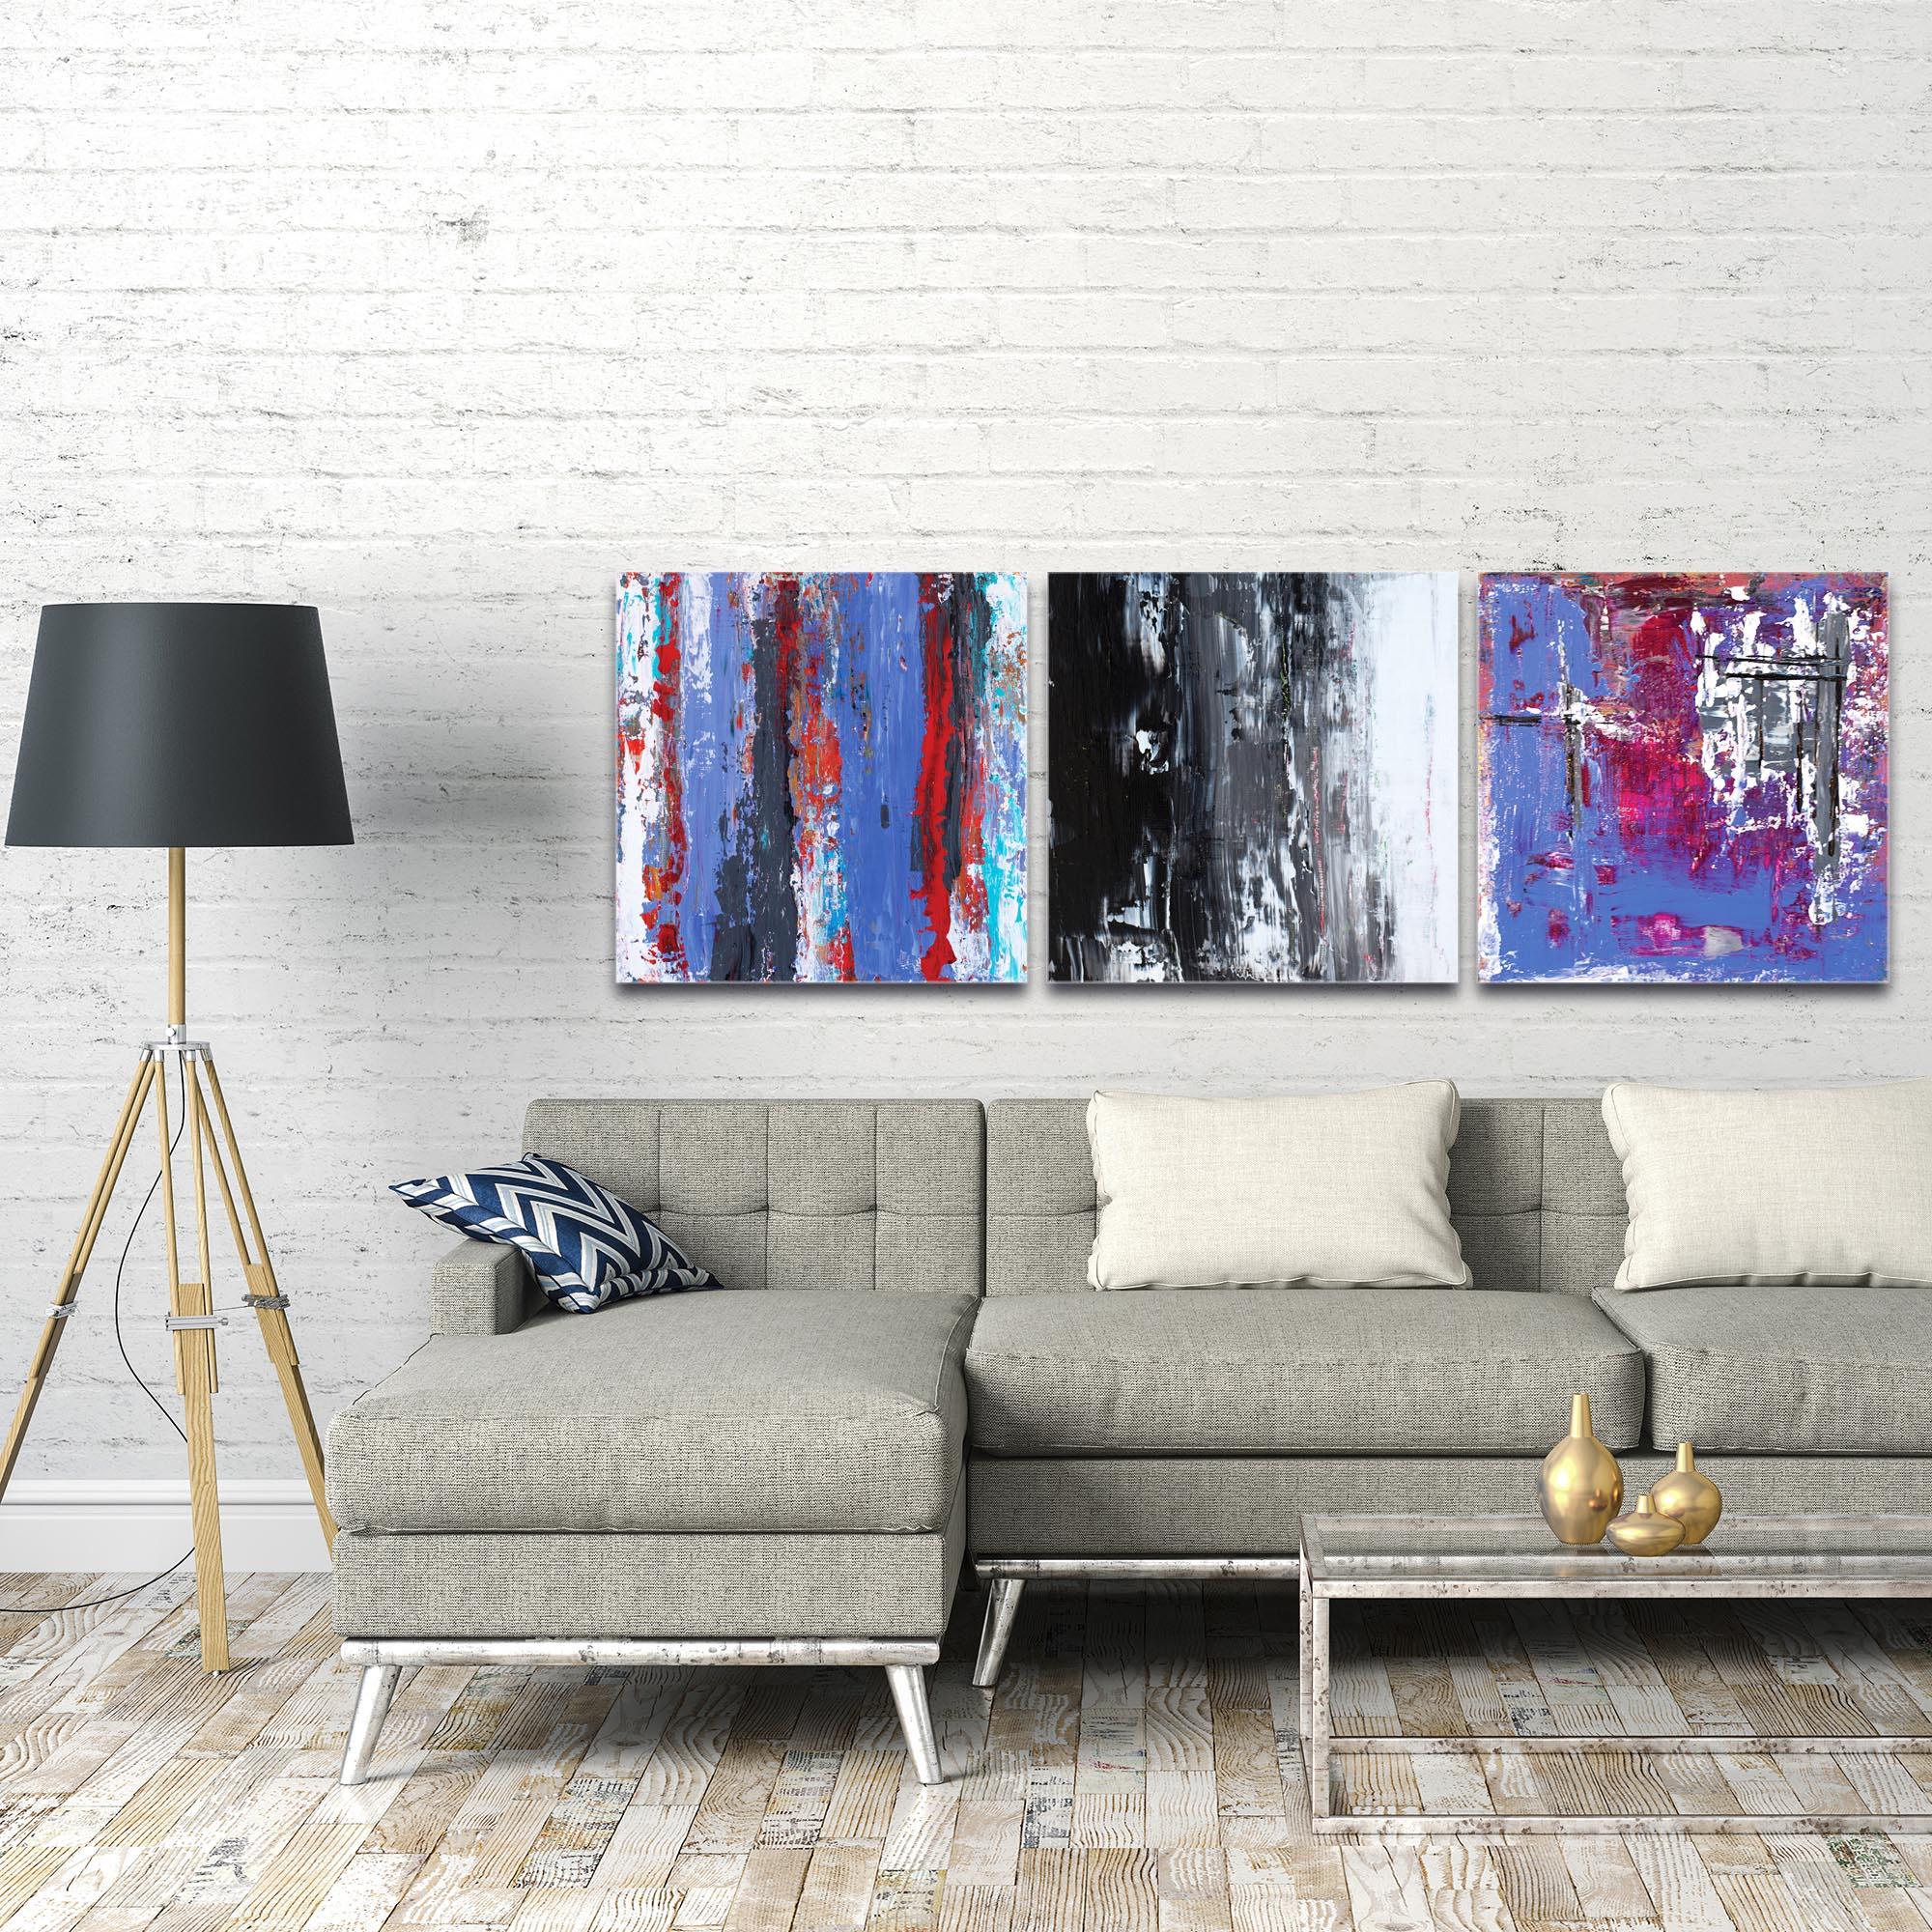 Abstract Wall Art 'Urban Triptych 4 Large' - Urban Decor on Metal or Plexiglass - Image 3